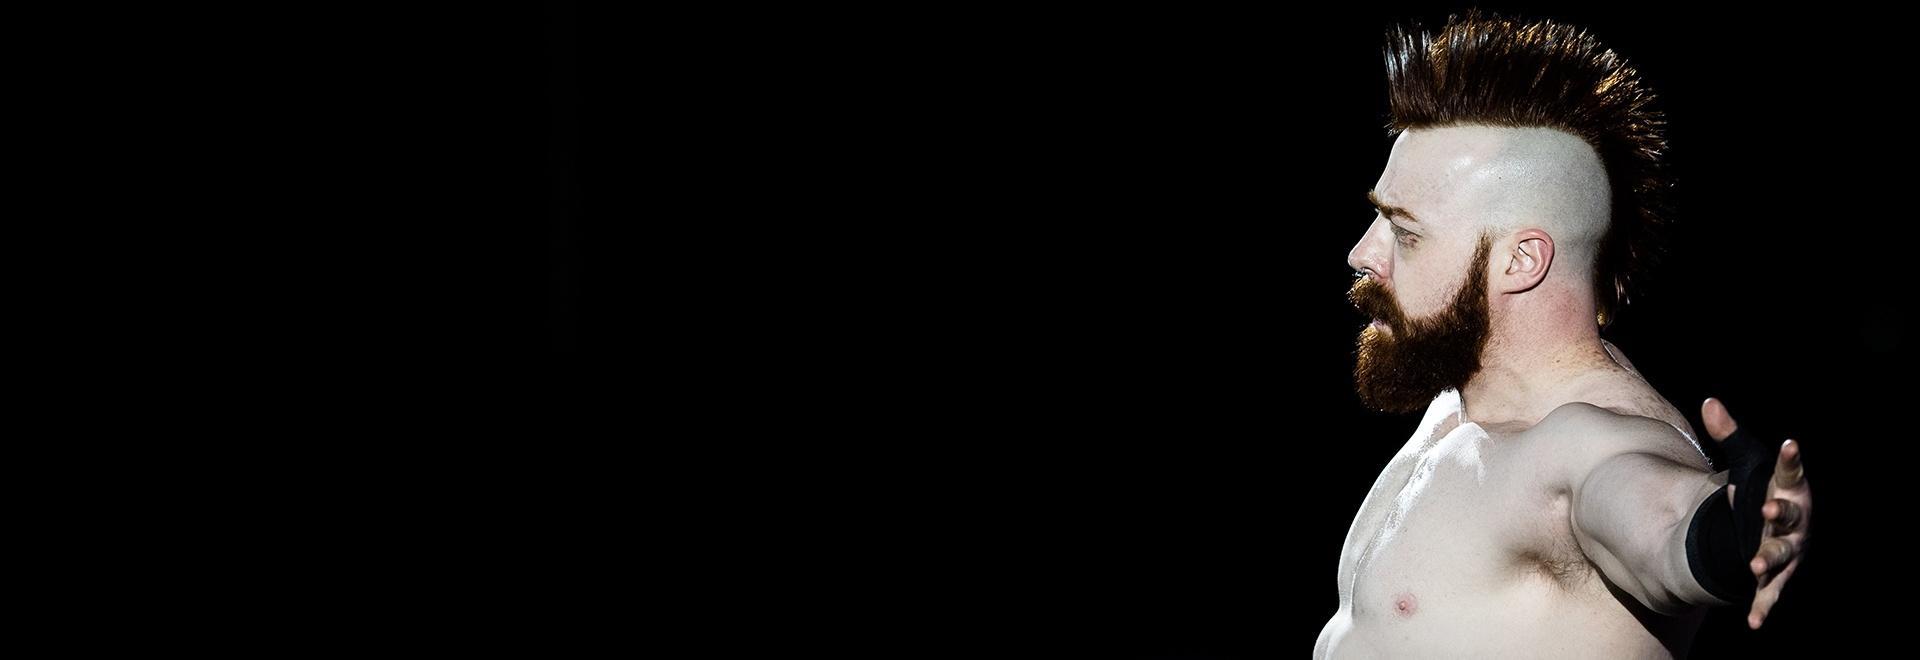 Ep. 30